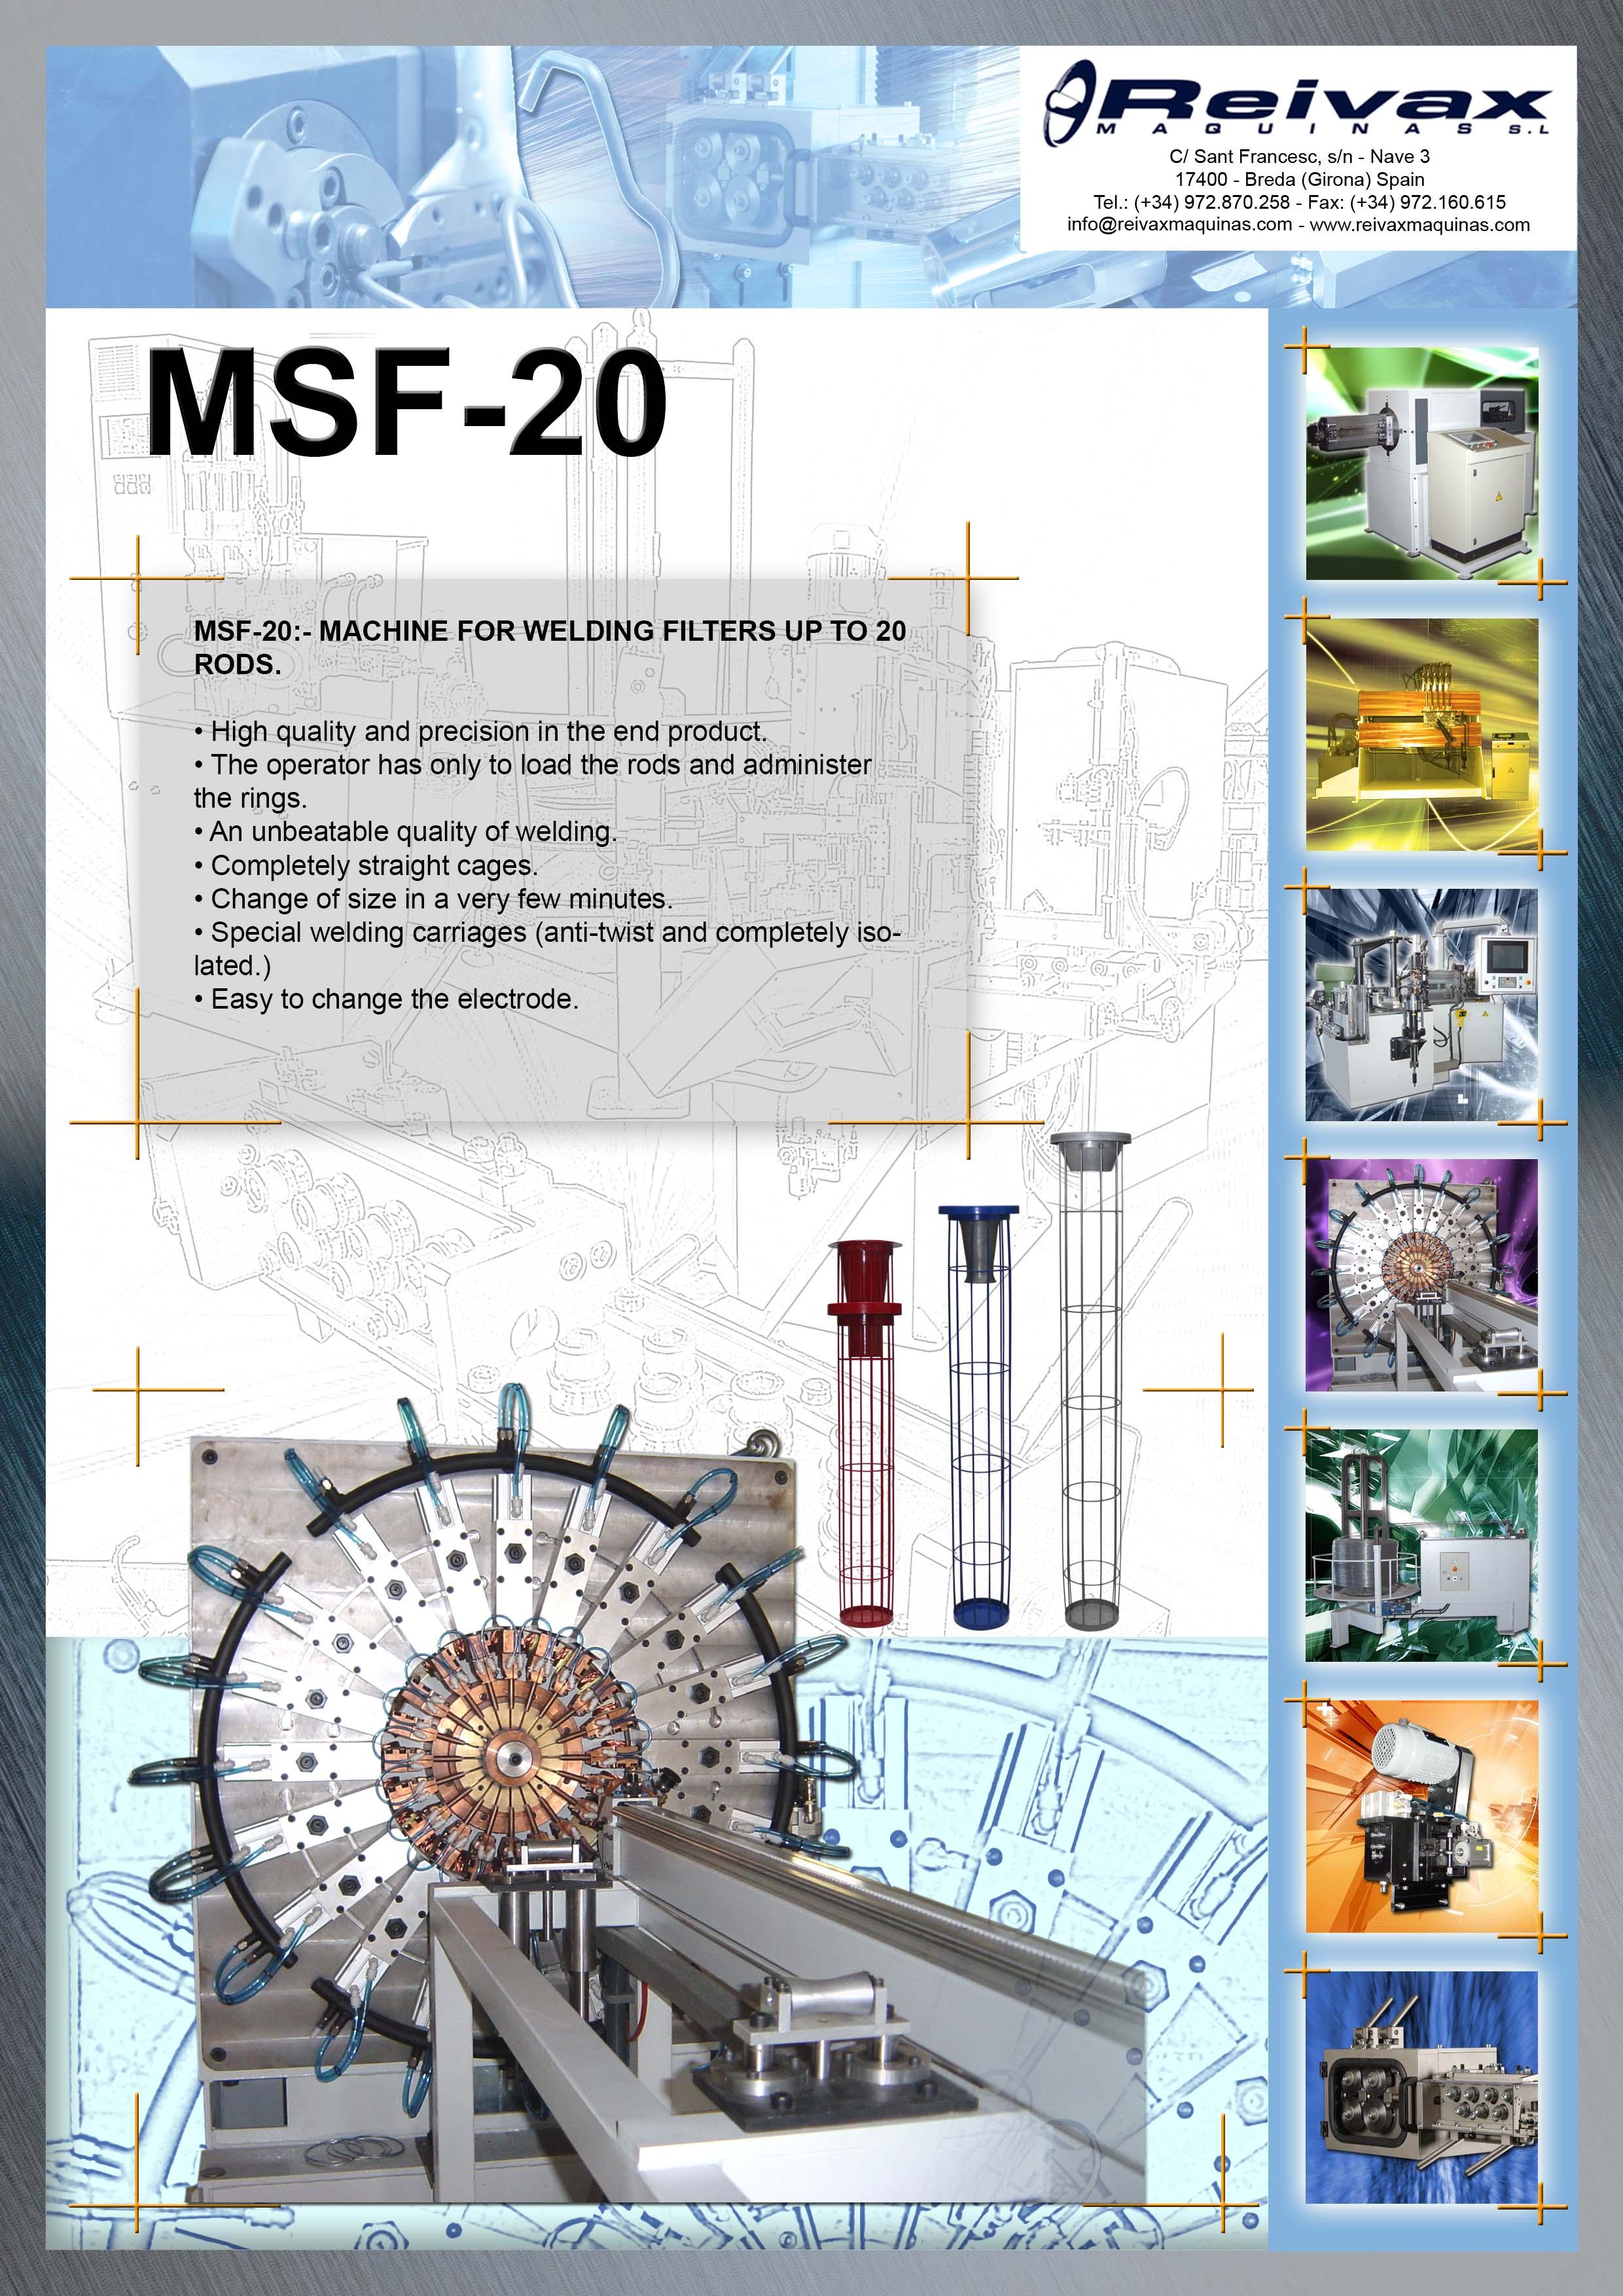 ReivaxMaquinas: Technical Details MSF-20